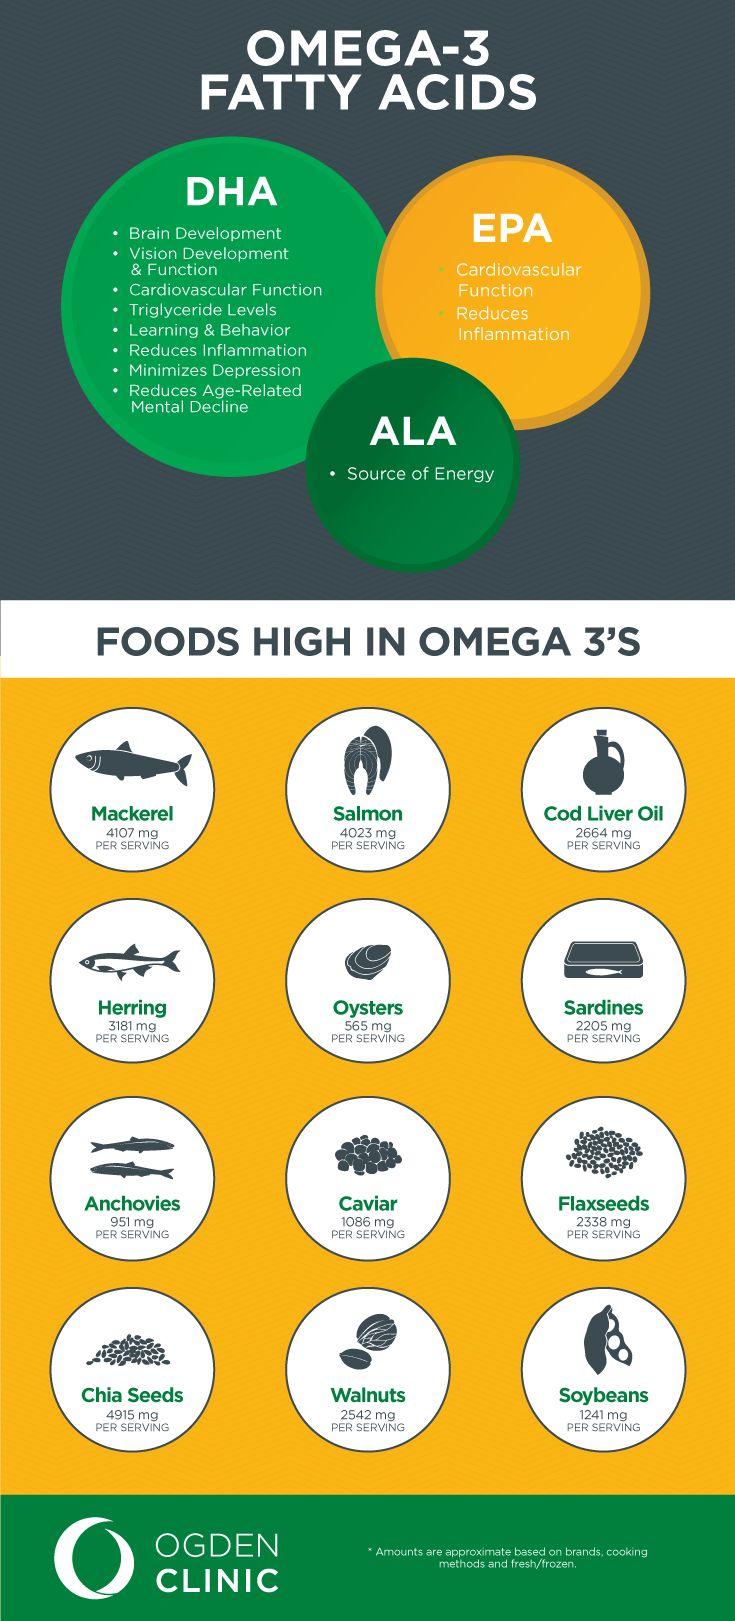 Health Benefits of Omega 3 Fish Oil